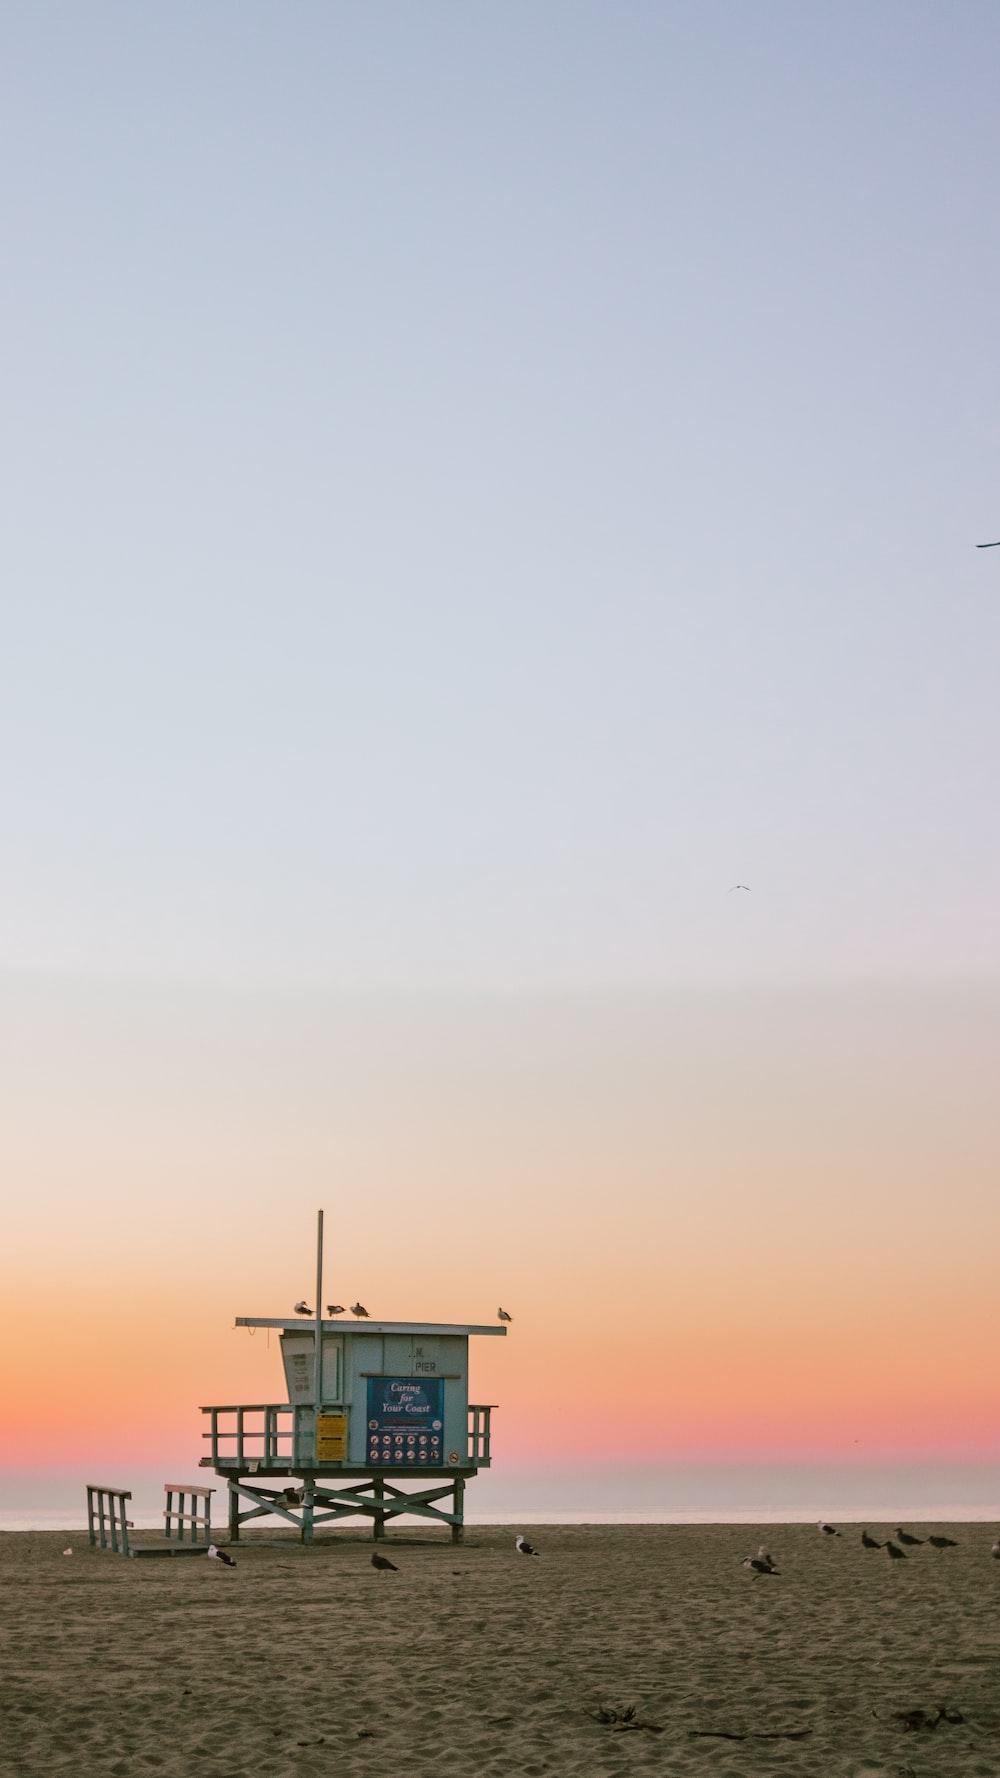 several birds on beach shore under blue sky